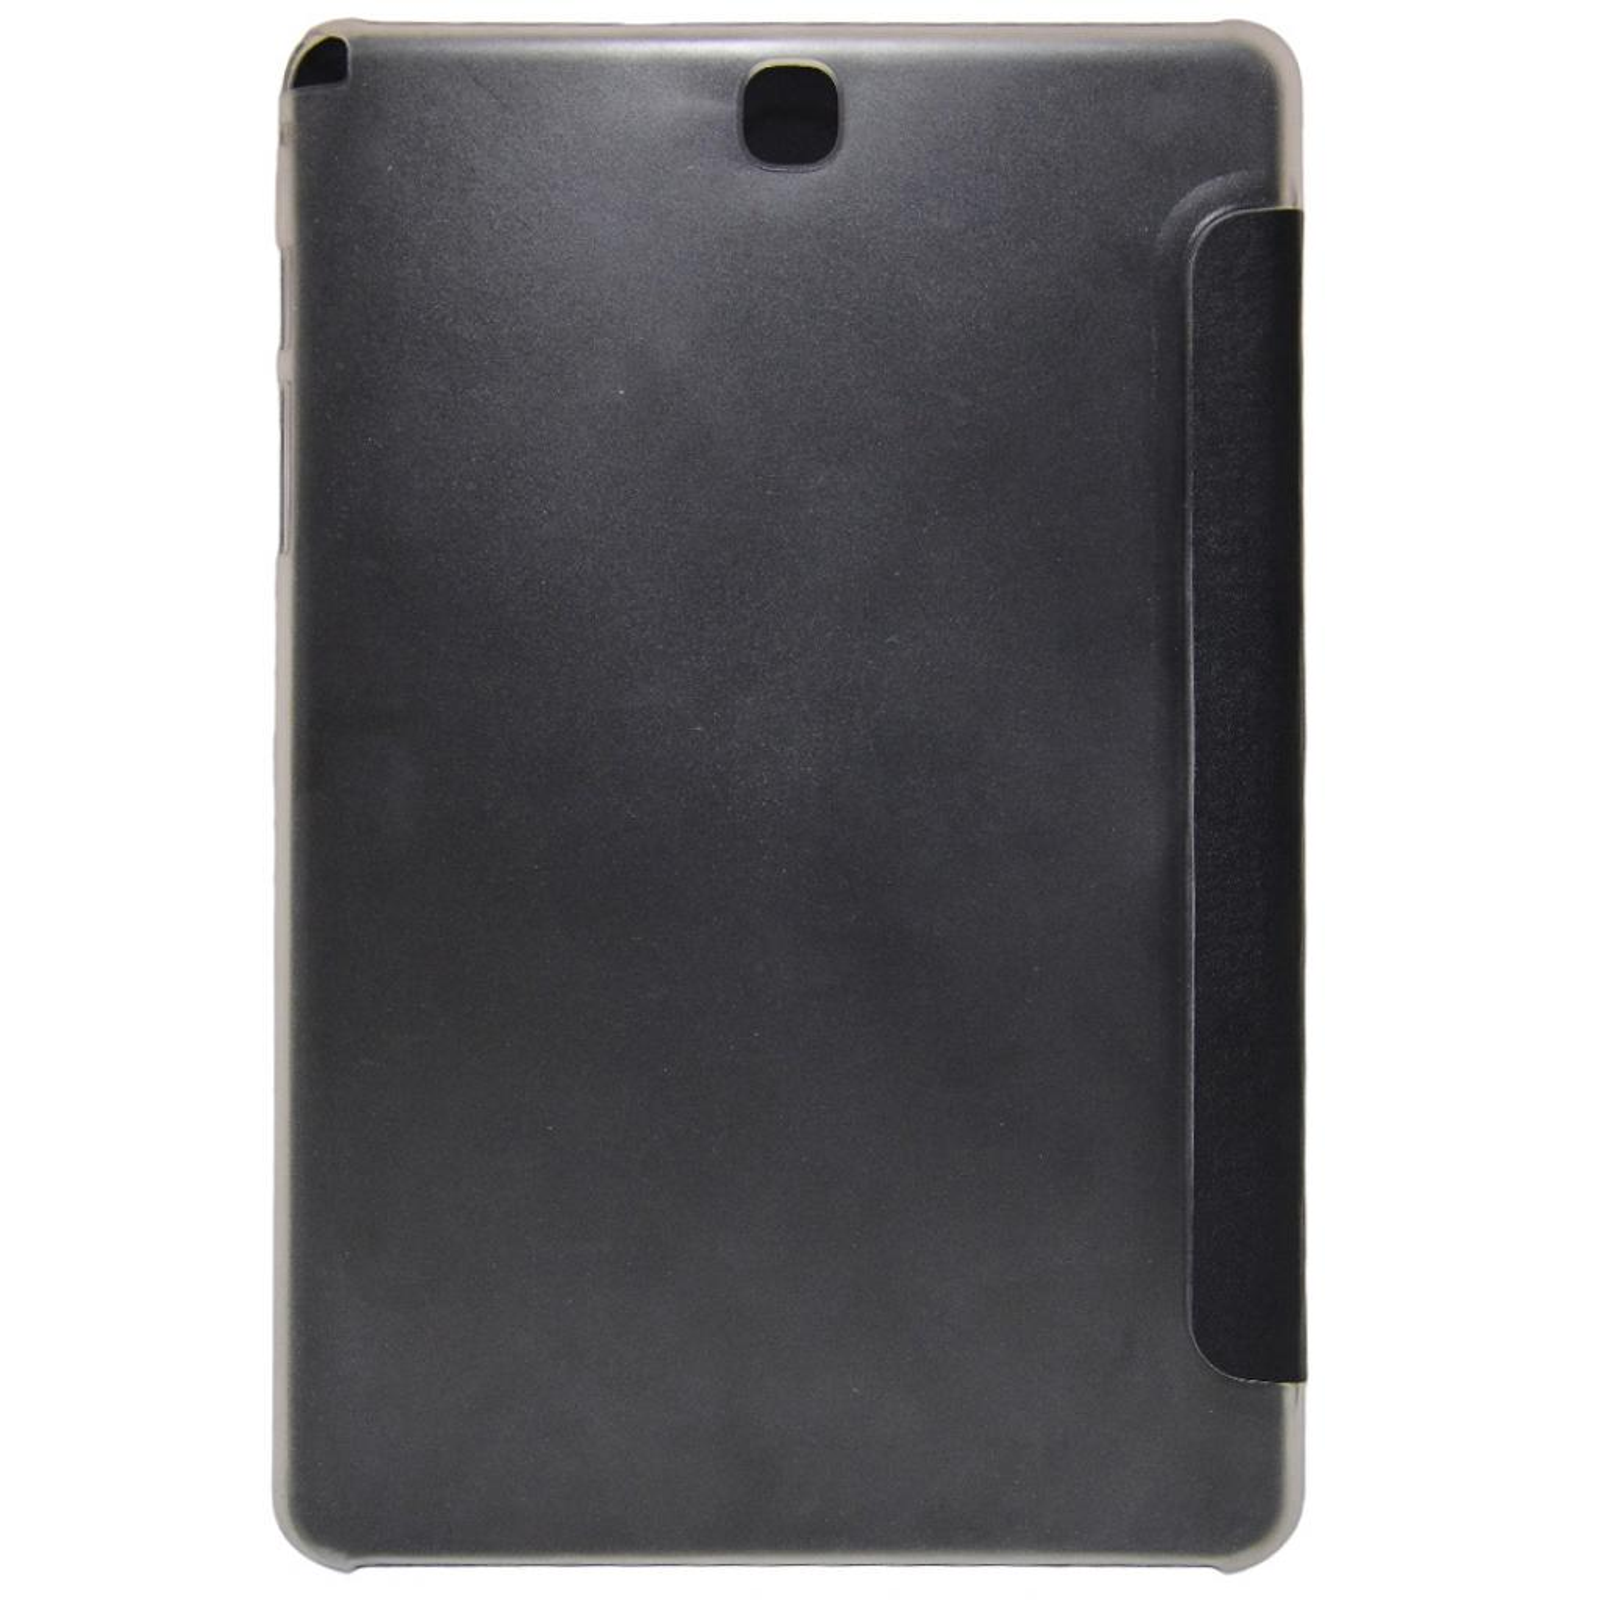 "Чехол для планшета Pro-case 9,7"" TFC Samsung T550/555(Tab A) Black (PCTFCT550Bl) изображение 2"